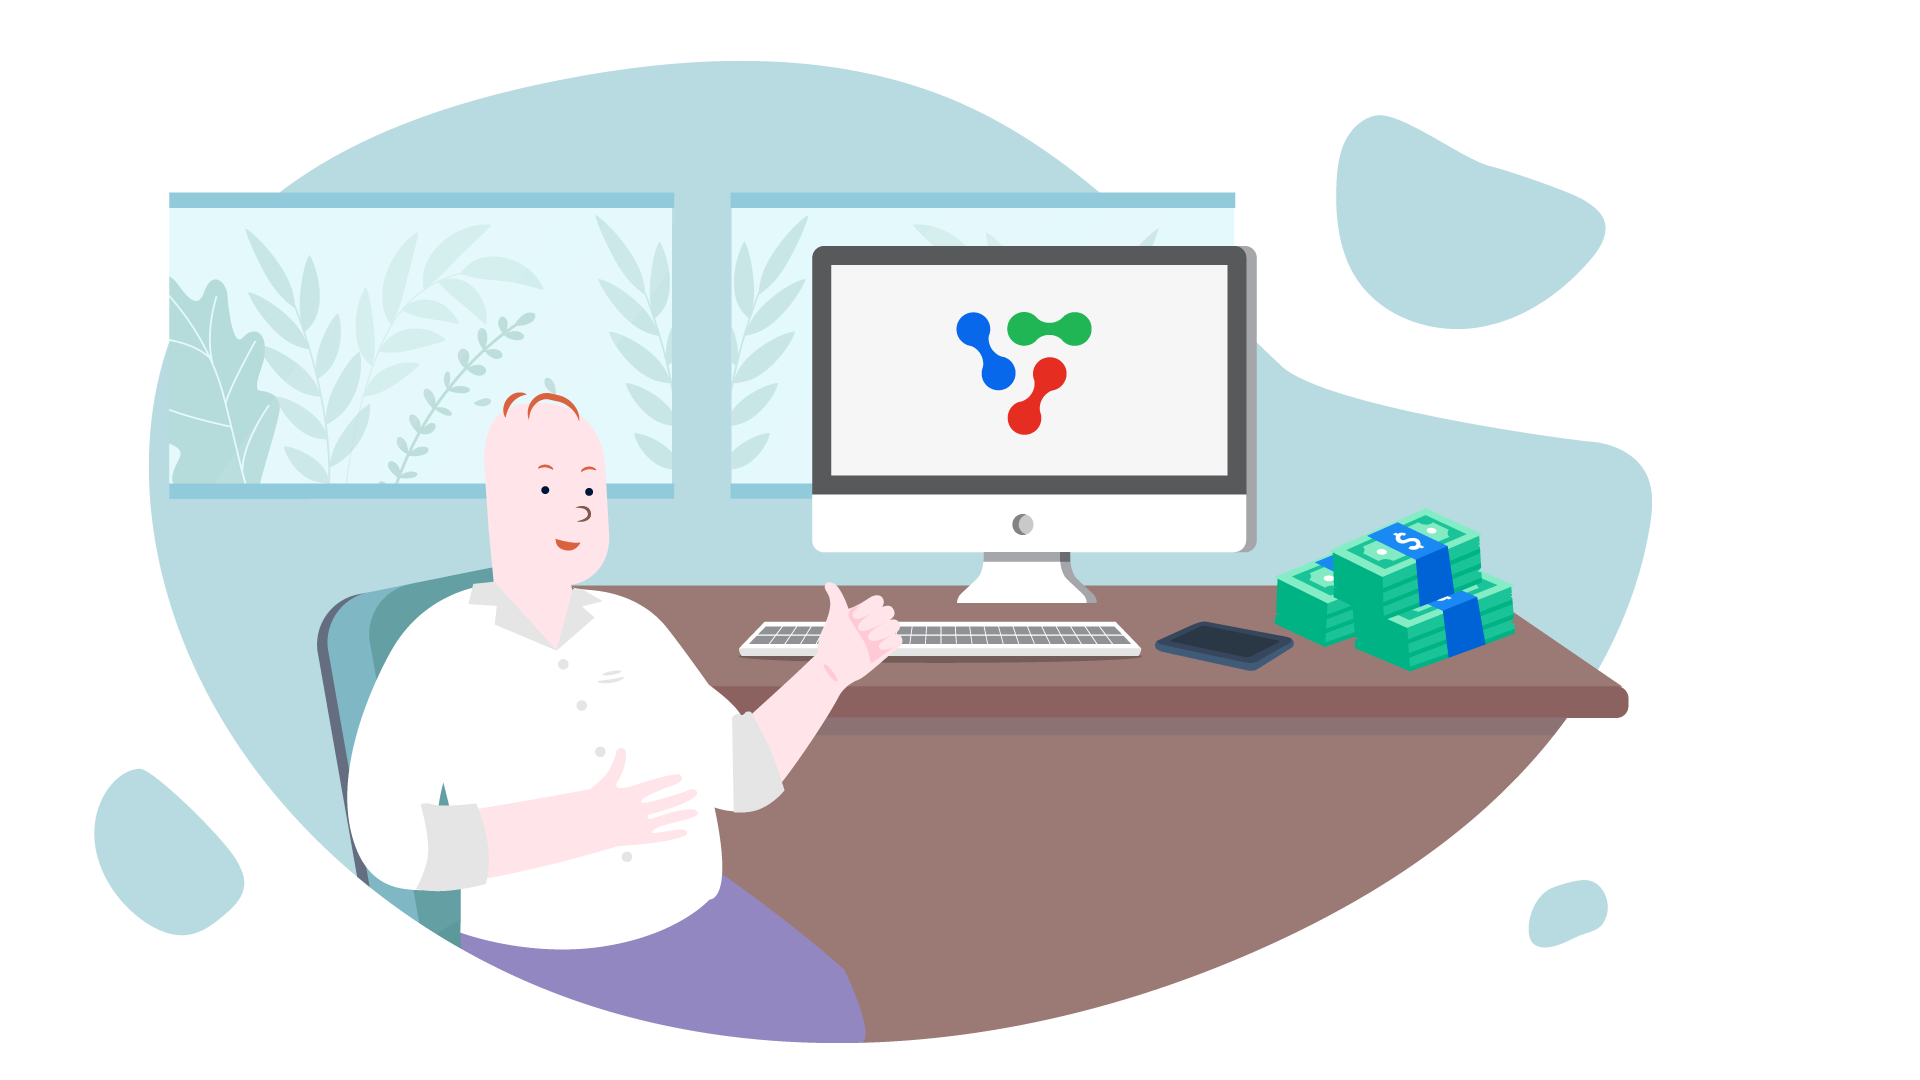 How does an Expert Network work?